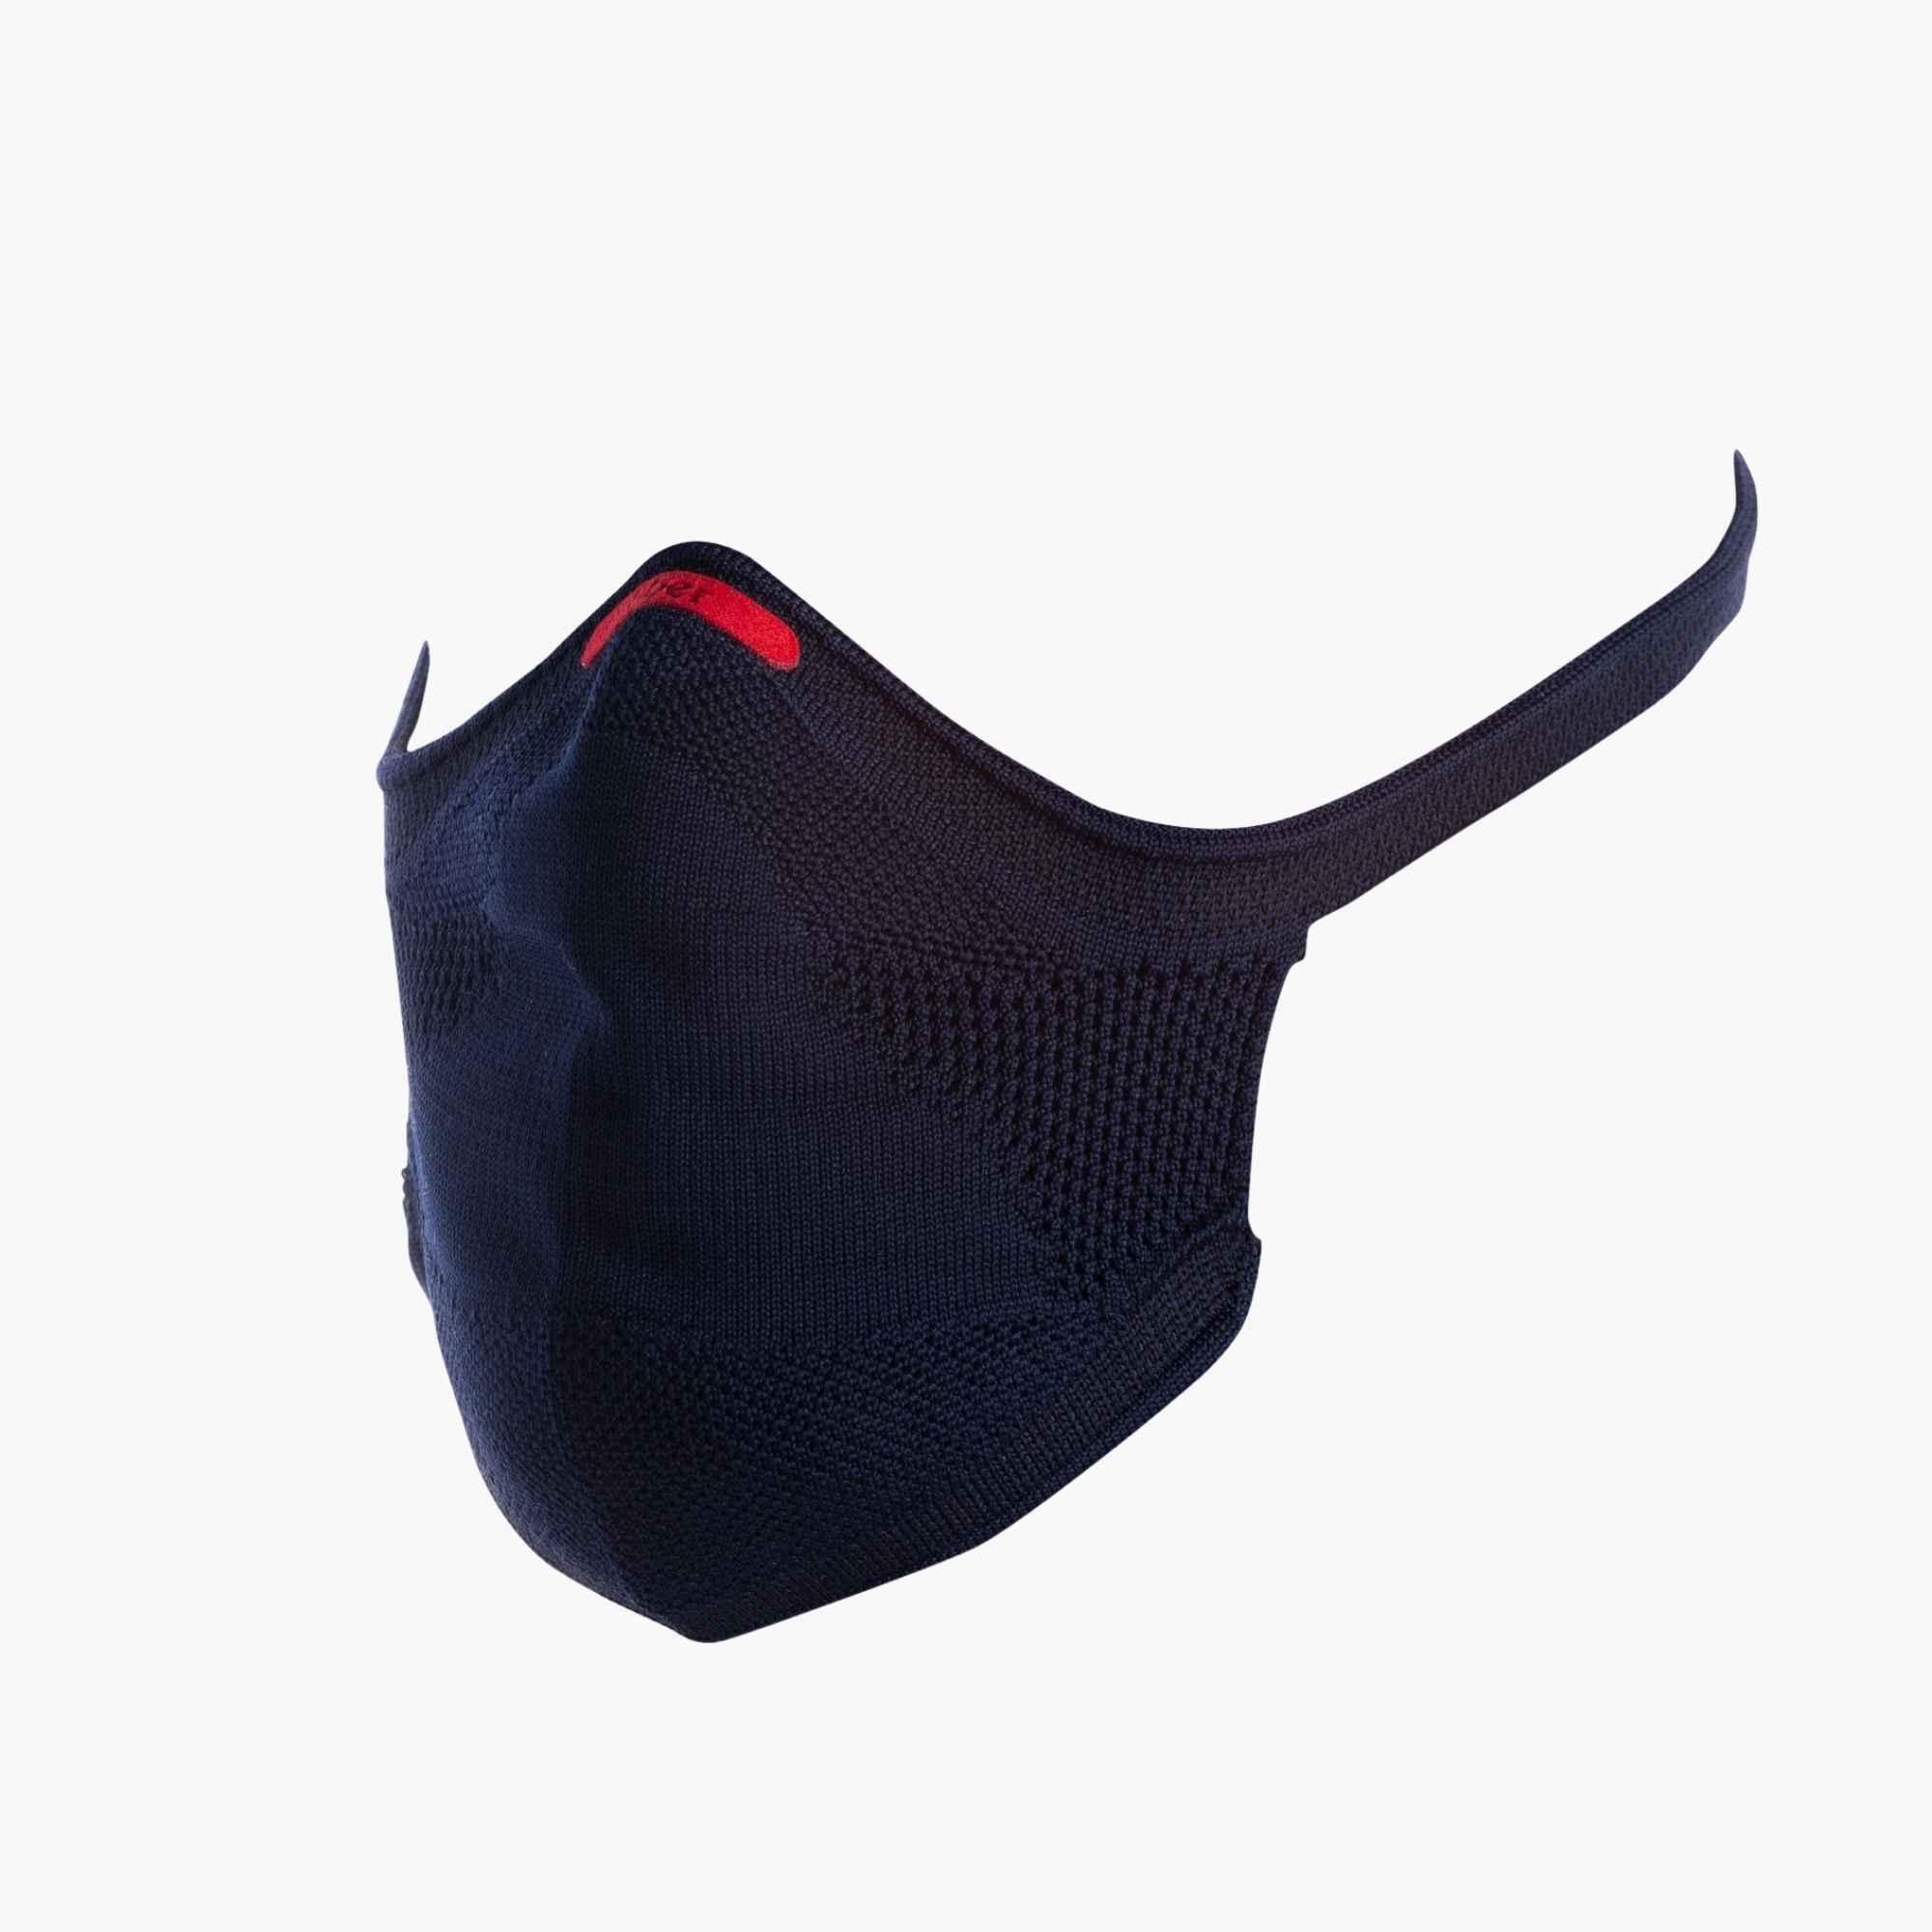 Máscara Esportiva KNIT - MARINHO